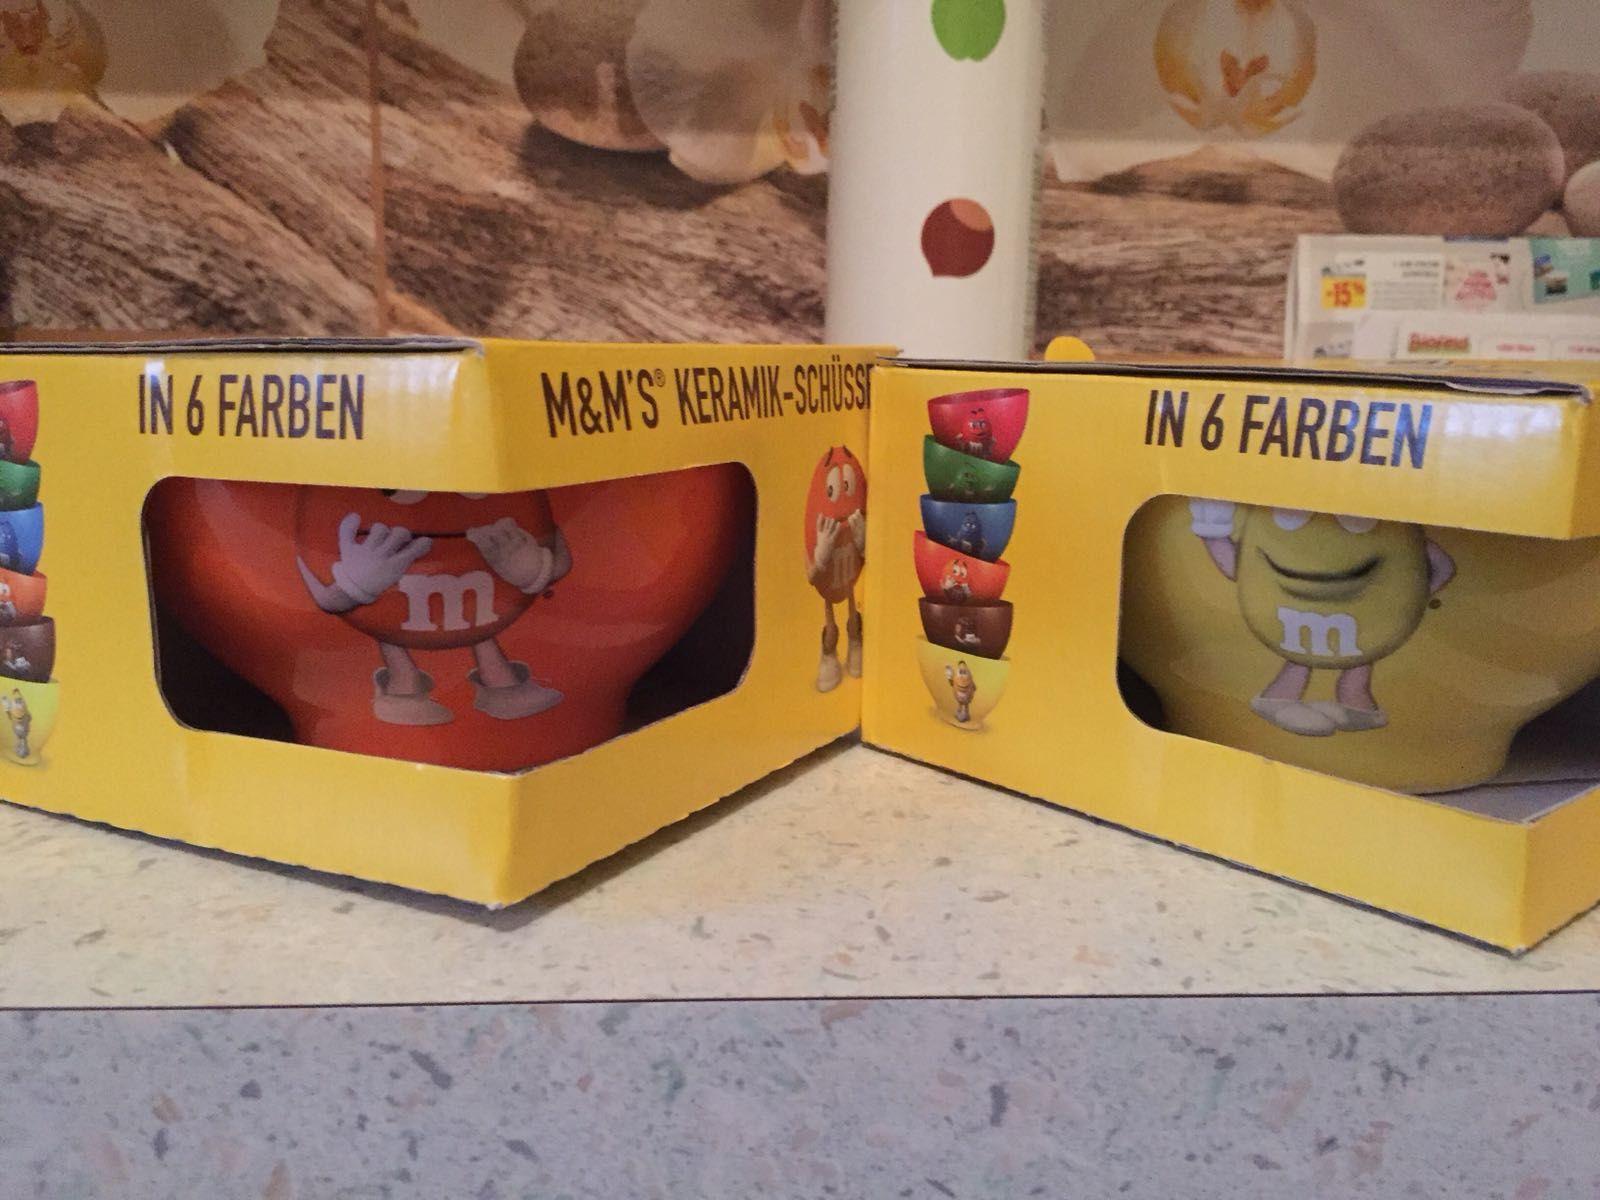 Gratis M&Ms Keramikschüssel bei SPAR